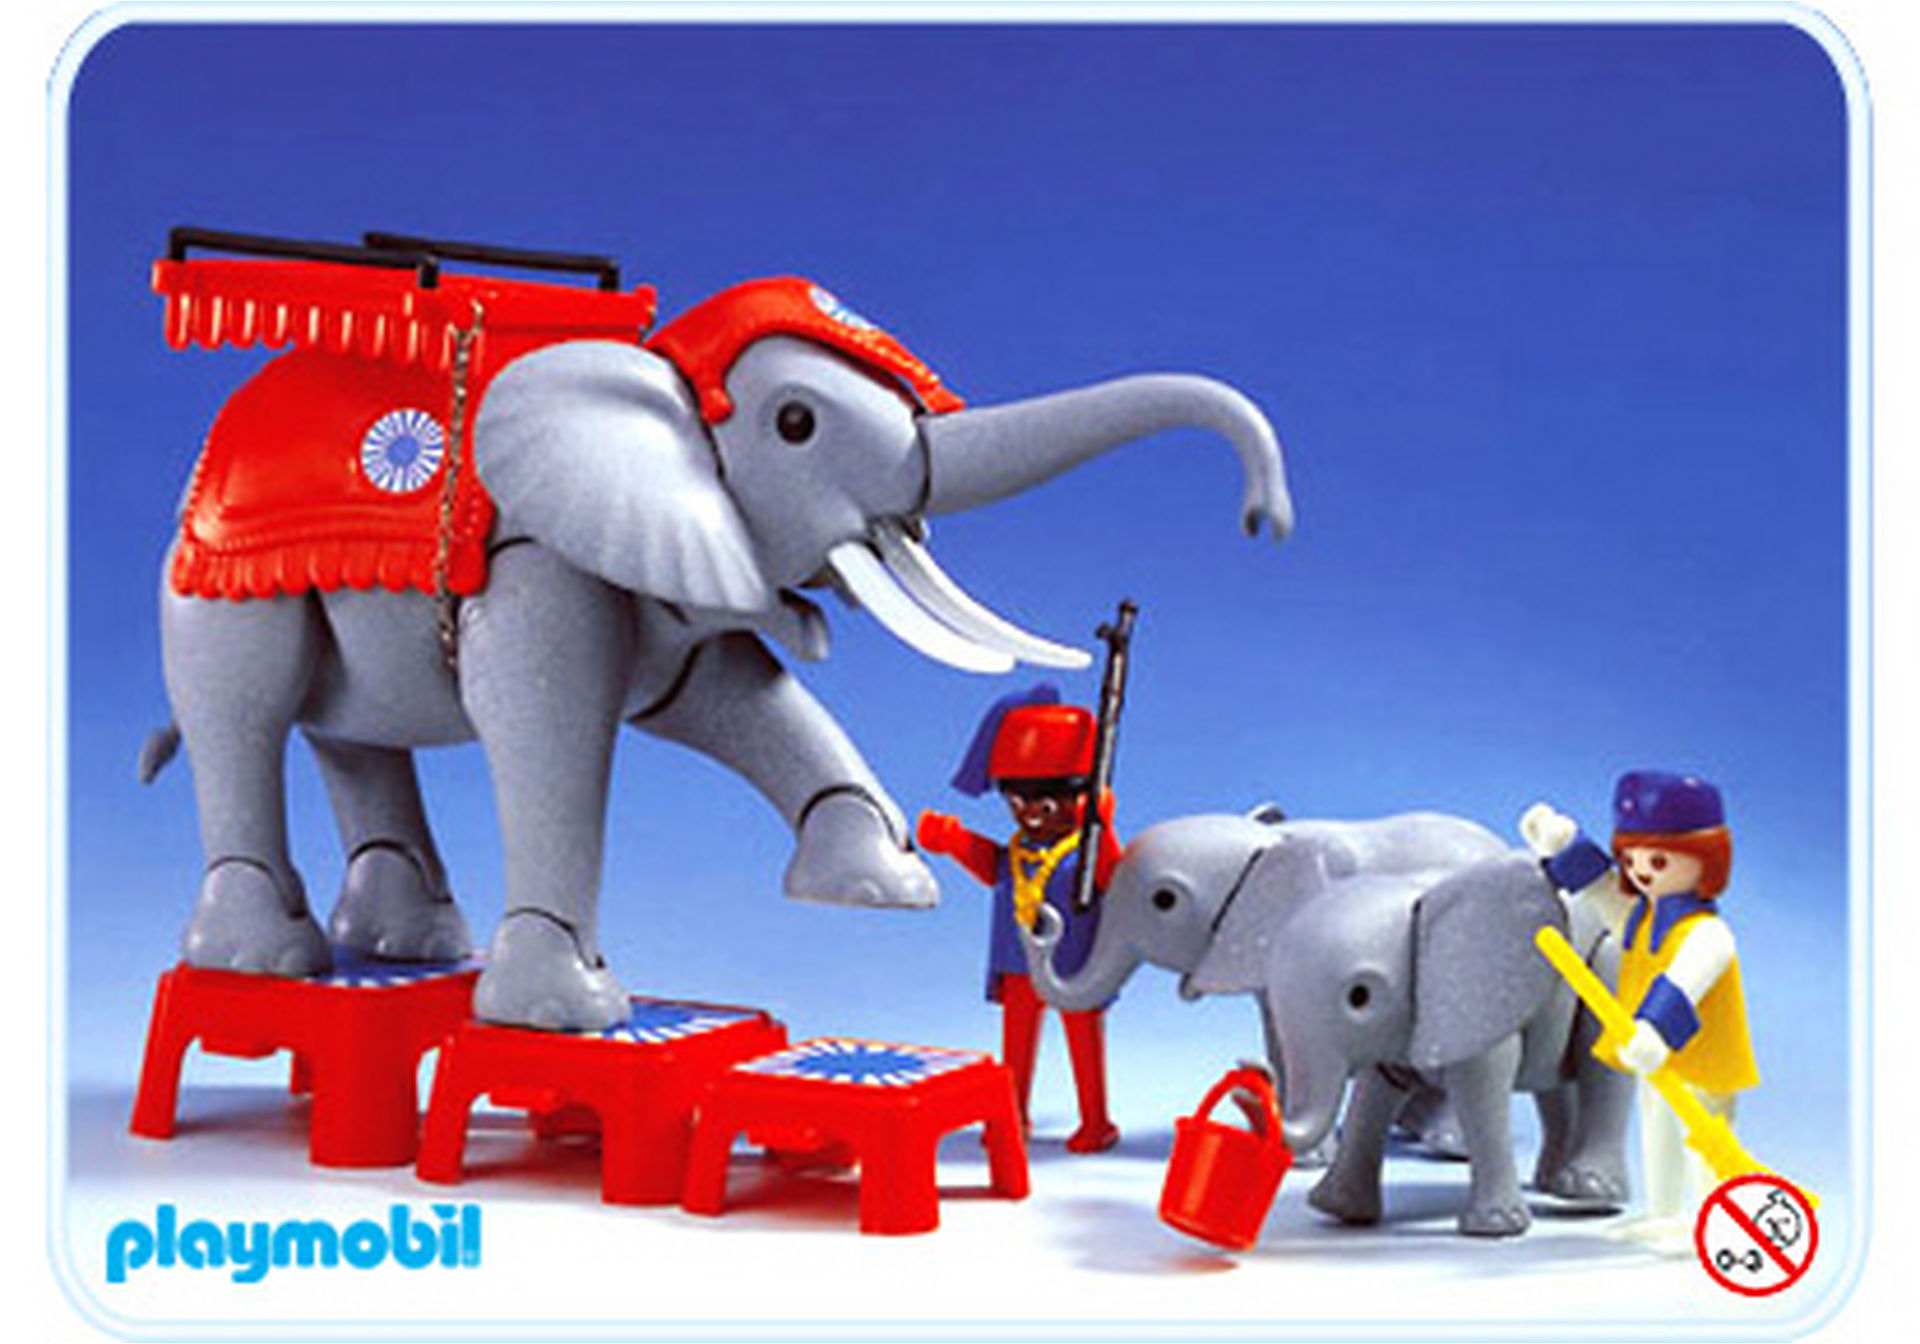 http://media.playmobil.com/i/playmobil/3519-A_product_detail/Dressage des éléphants